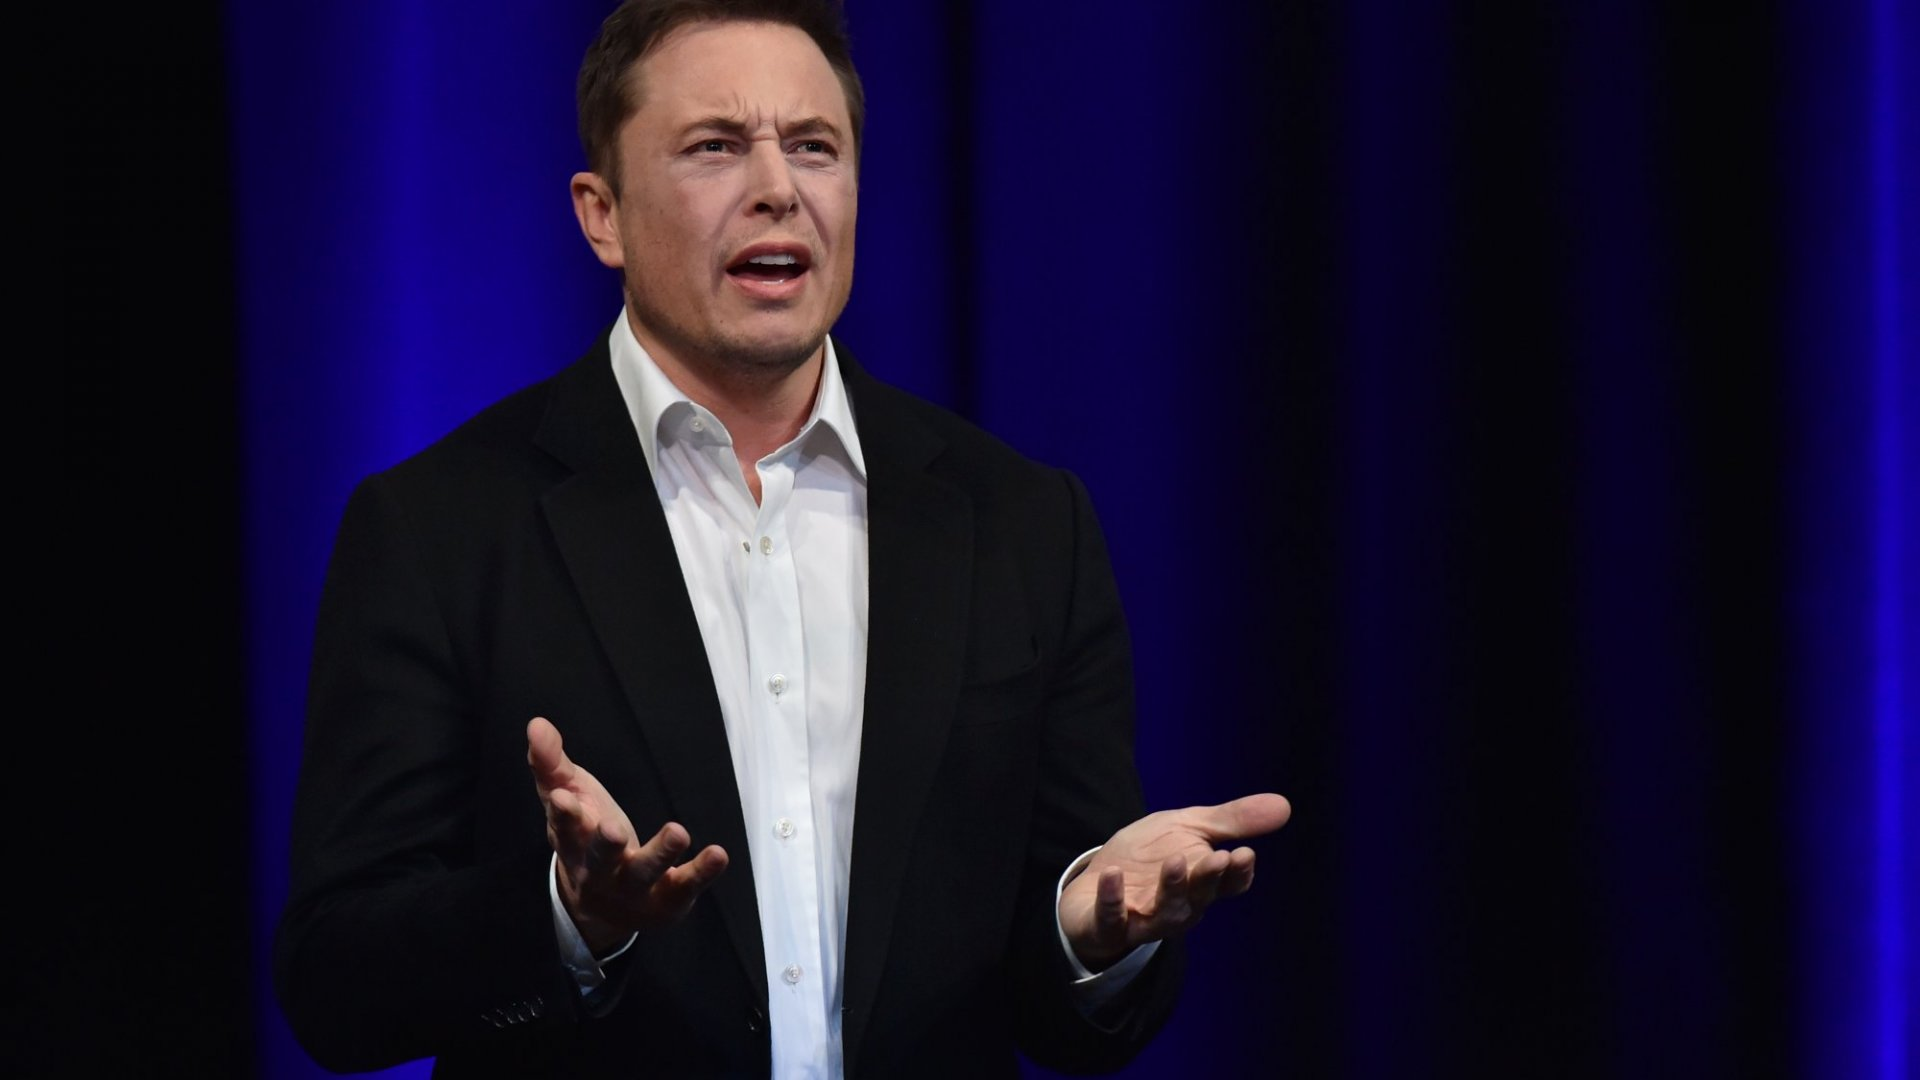 Elon Musk's Rude Tesla Earnings Call Behavior, Explained: 6 Reasons Why